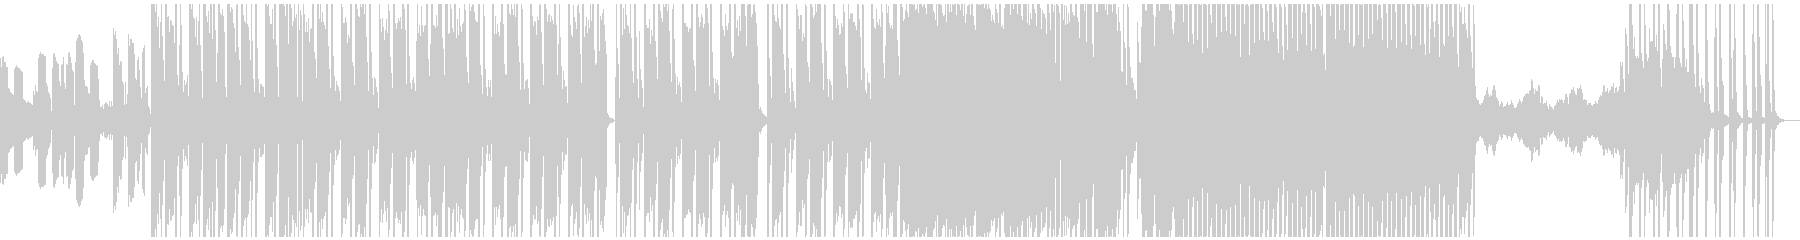 HIPHOP系BGMの未再生の波形